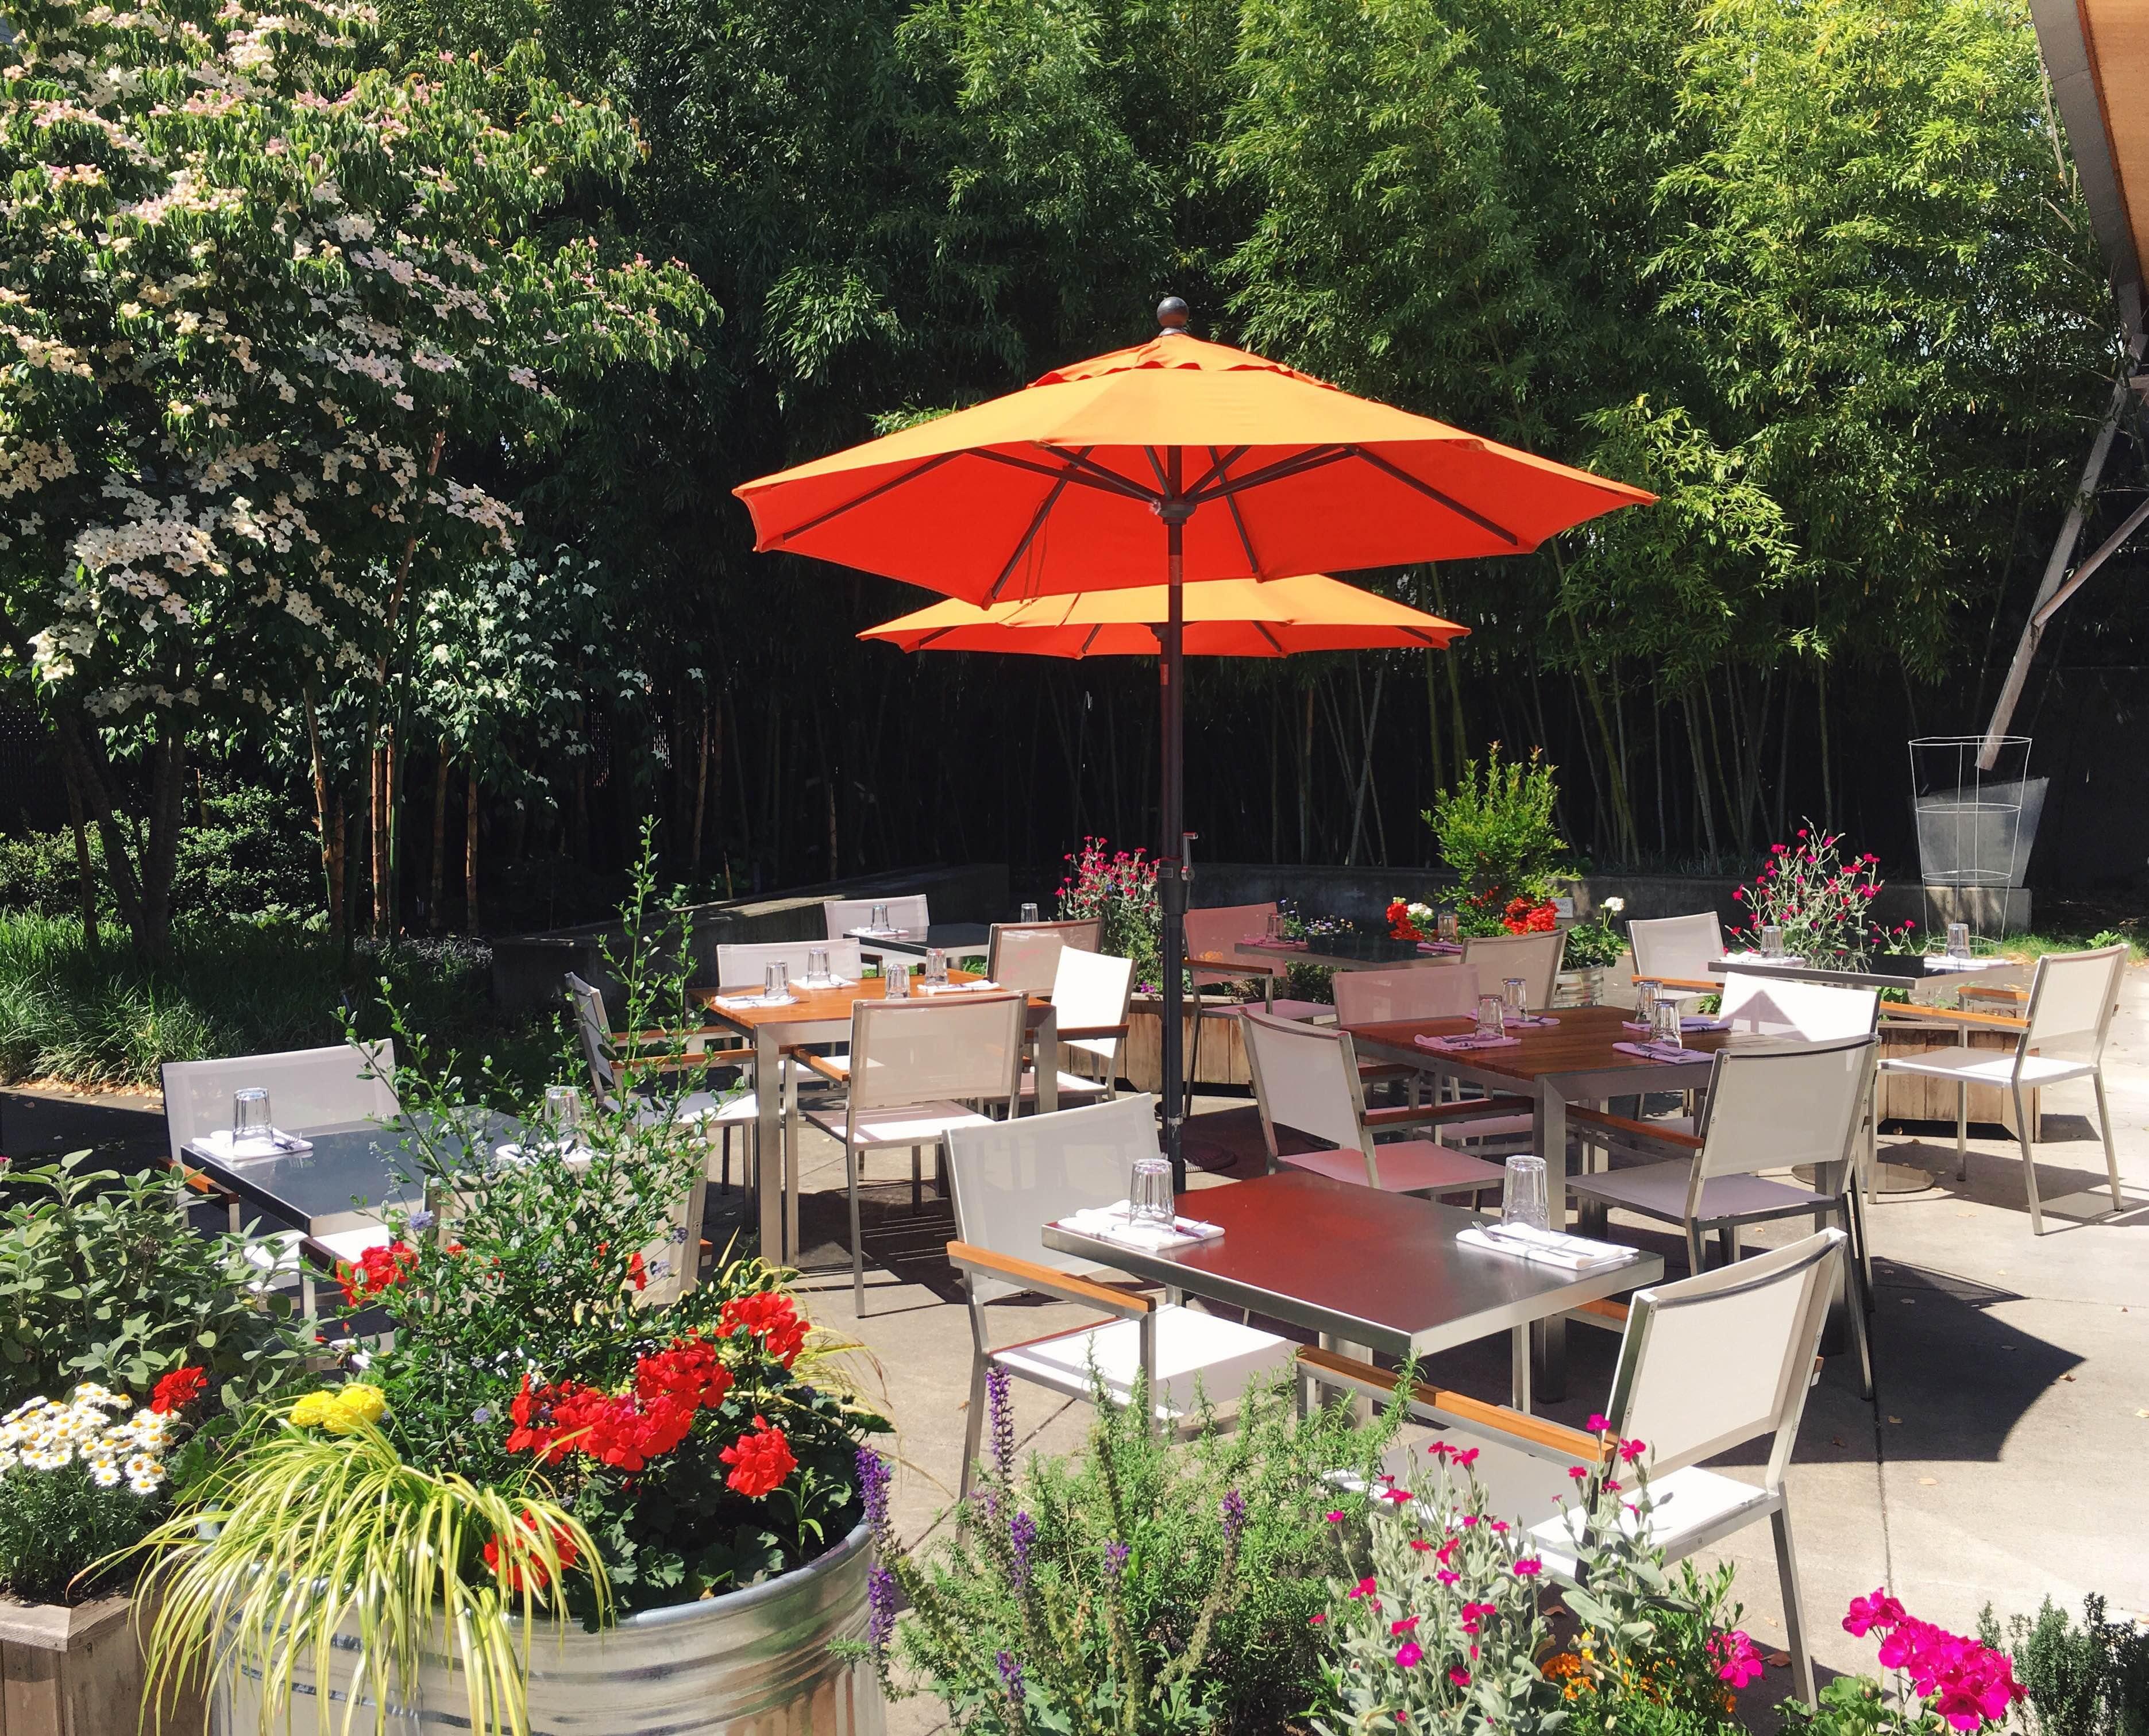 Burrasca's revamped patio on SE Clinton